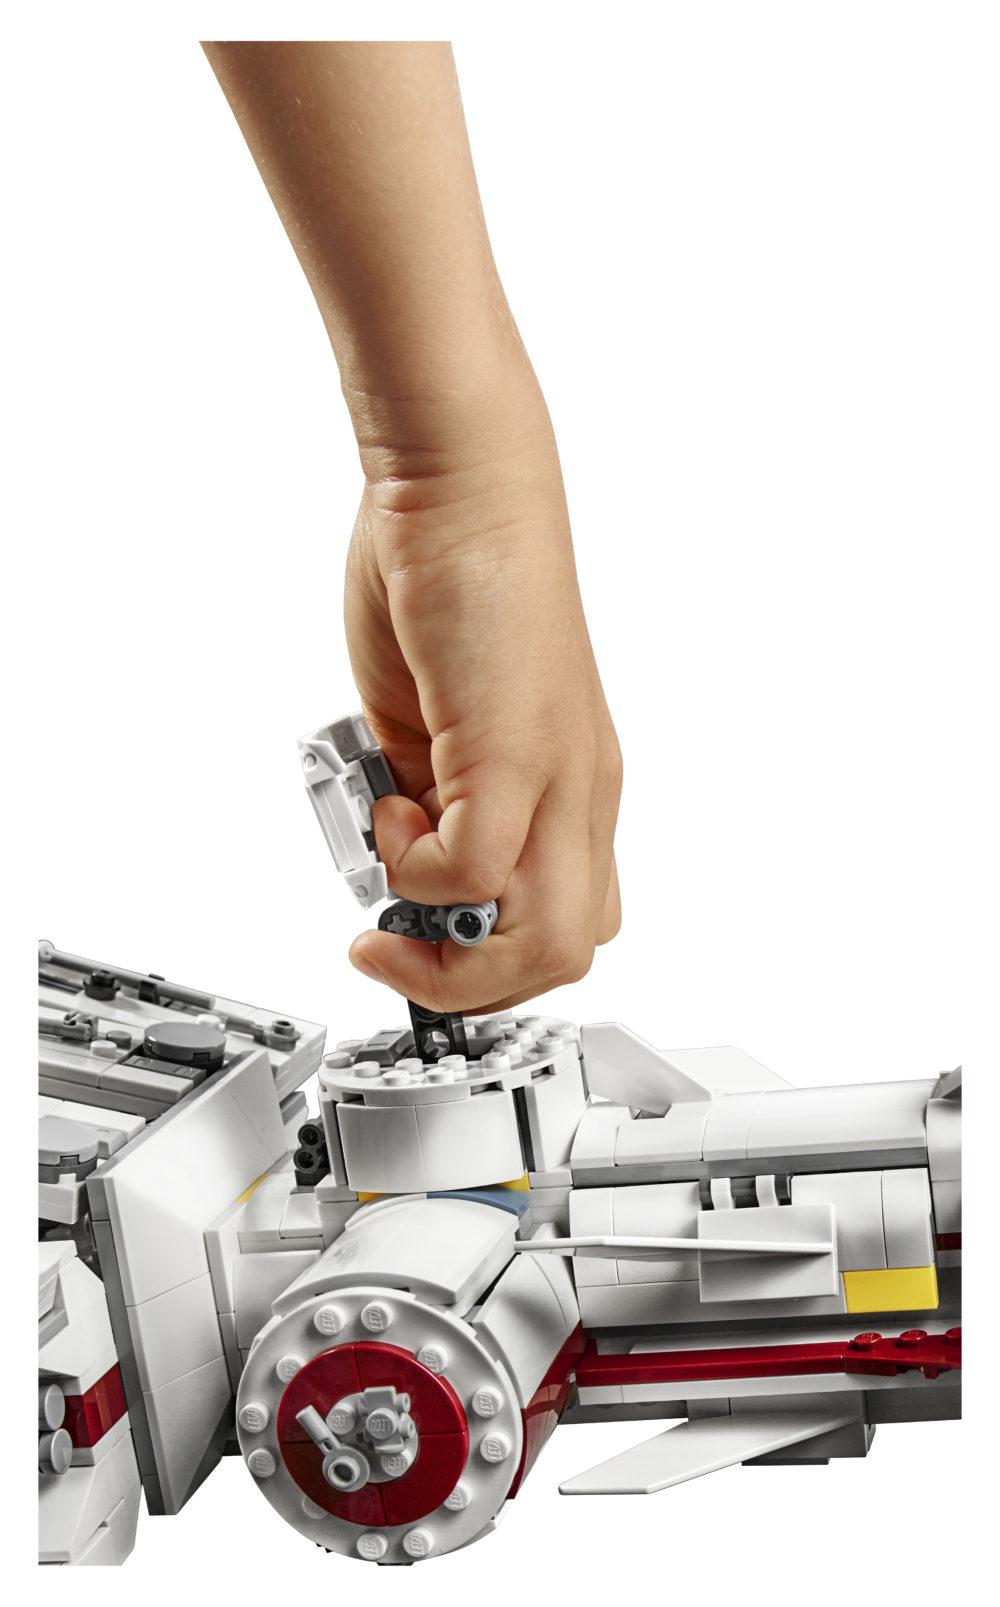 LEGO Star Wars 75244 - handle